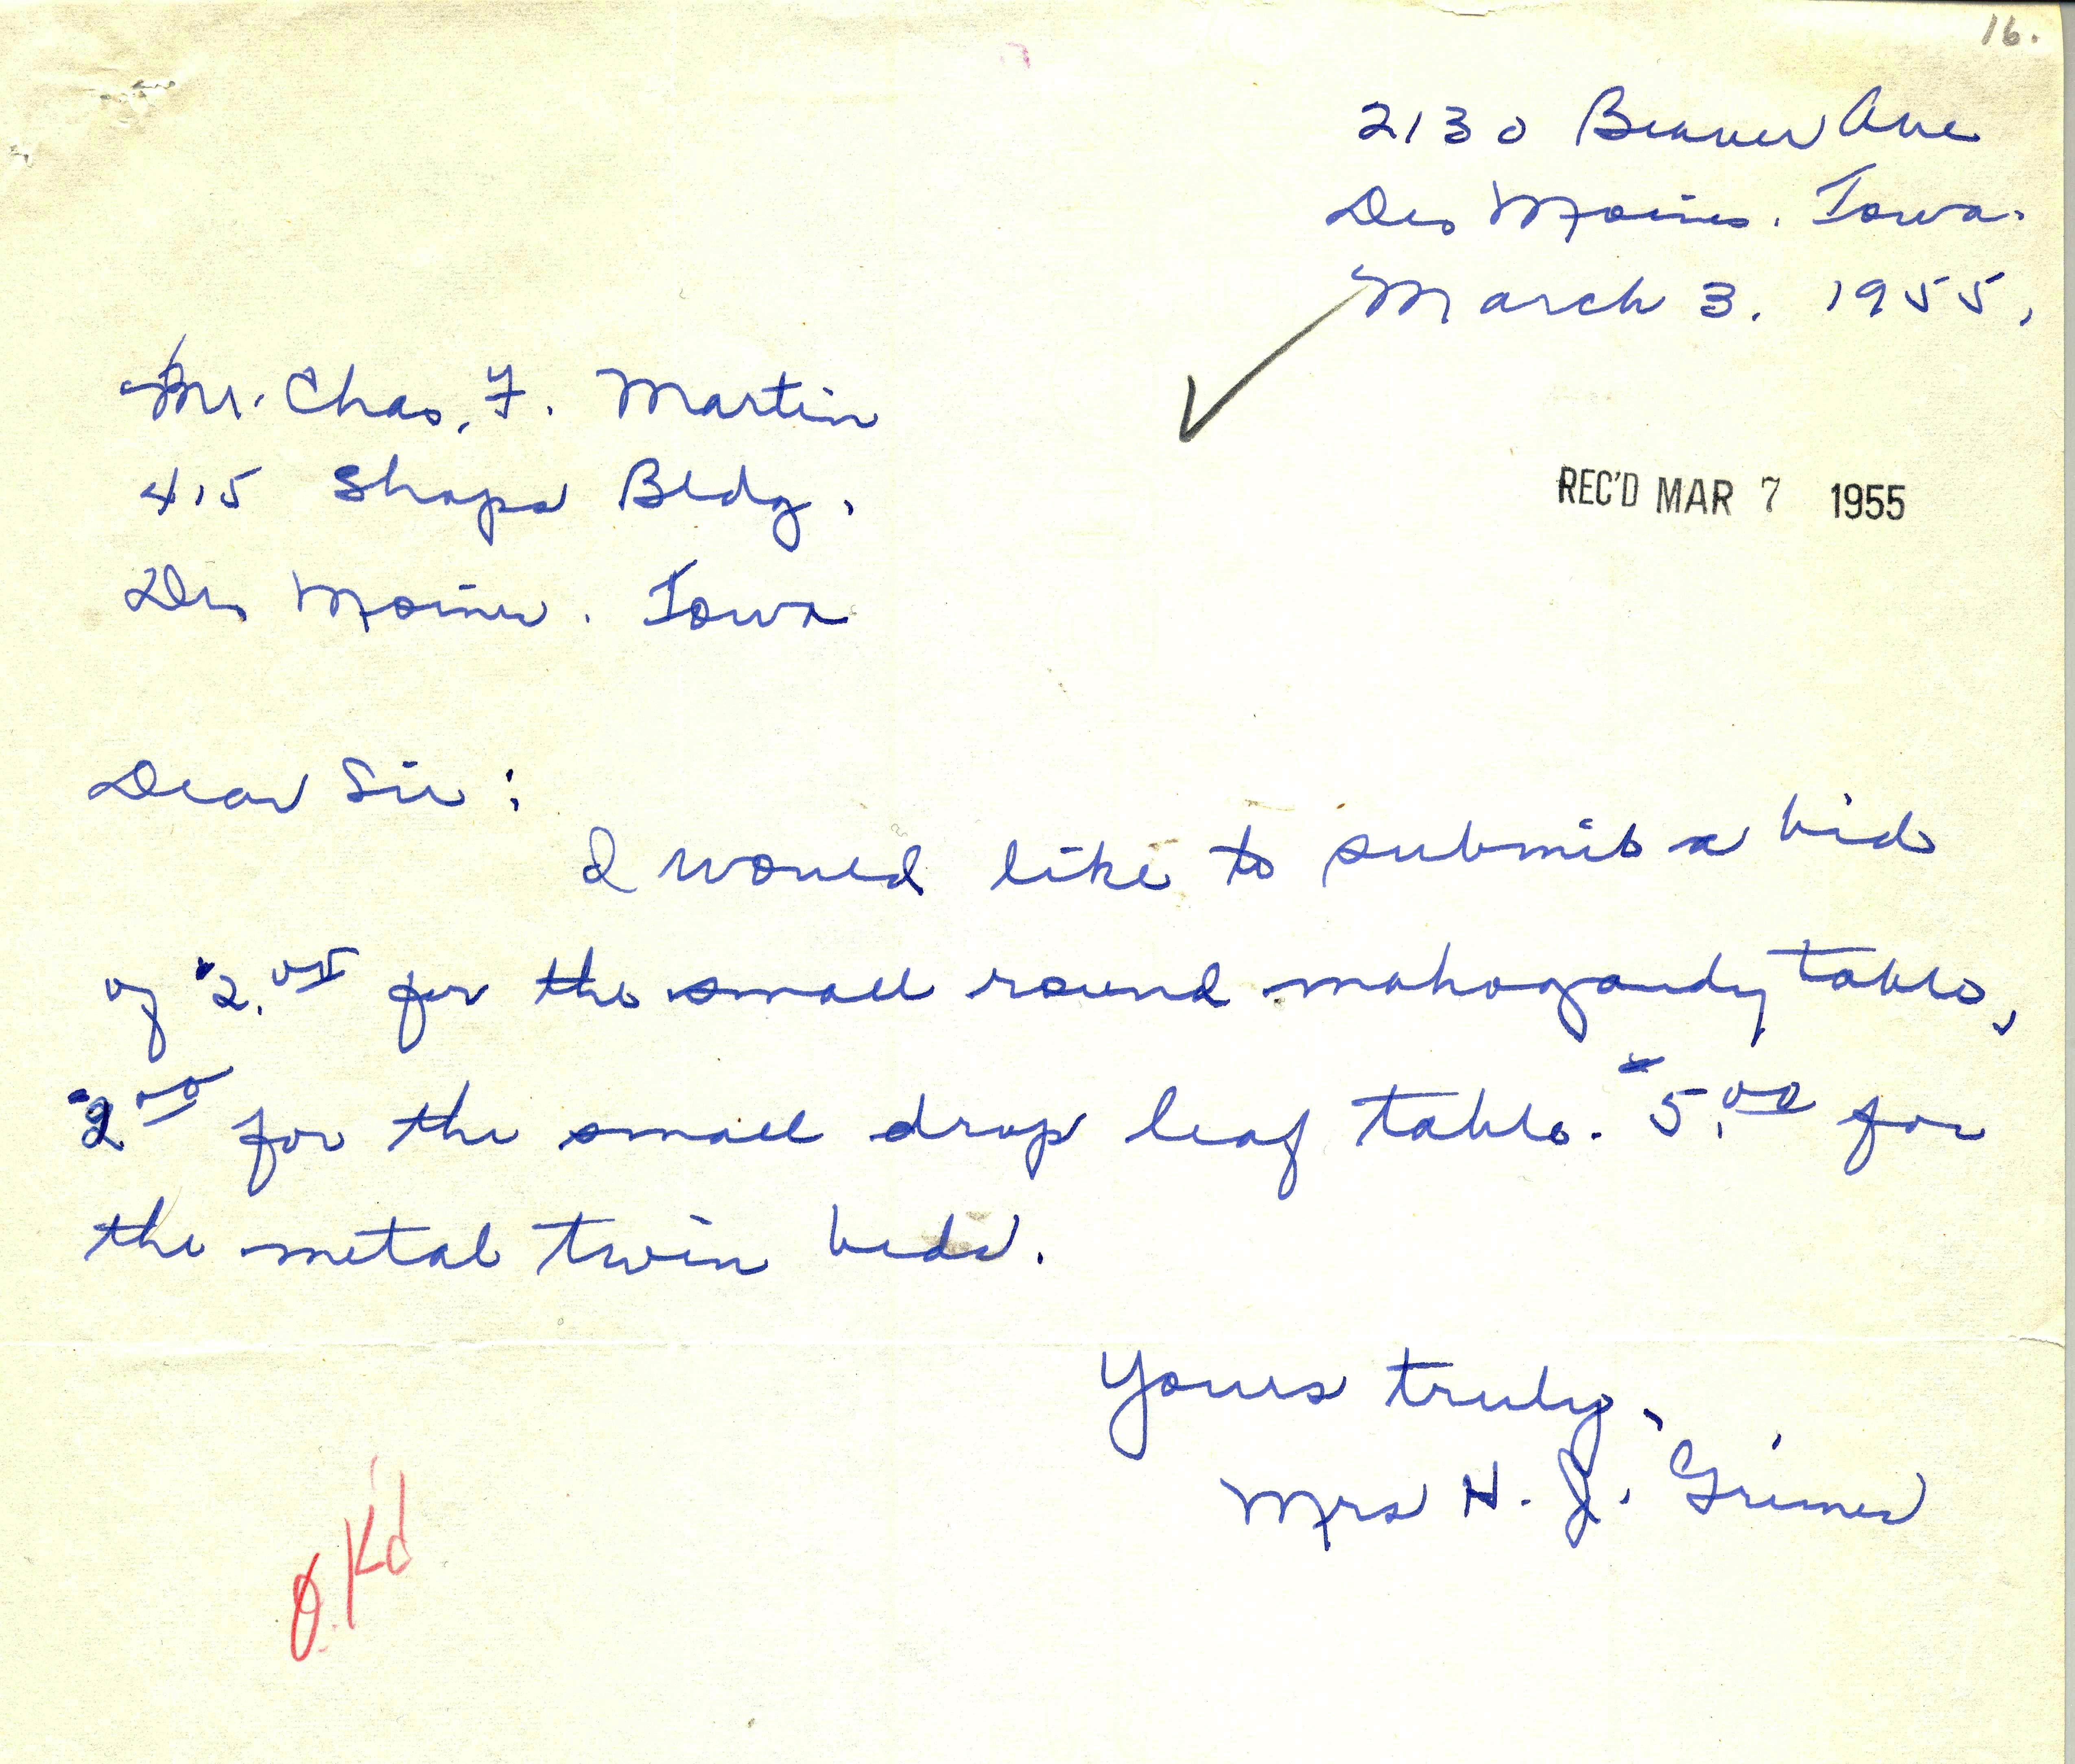 1955 Small bids